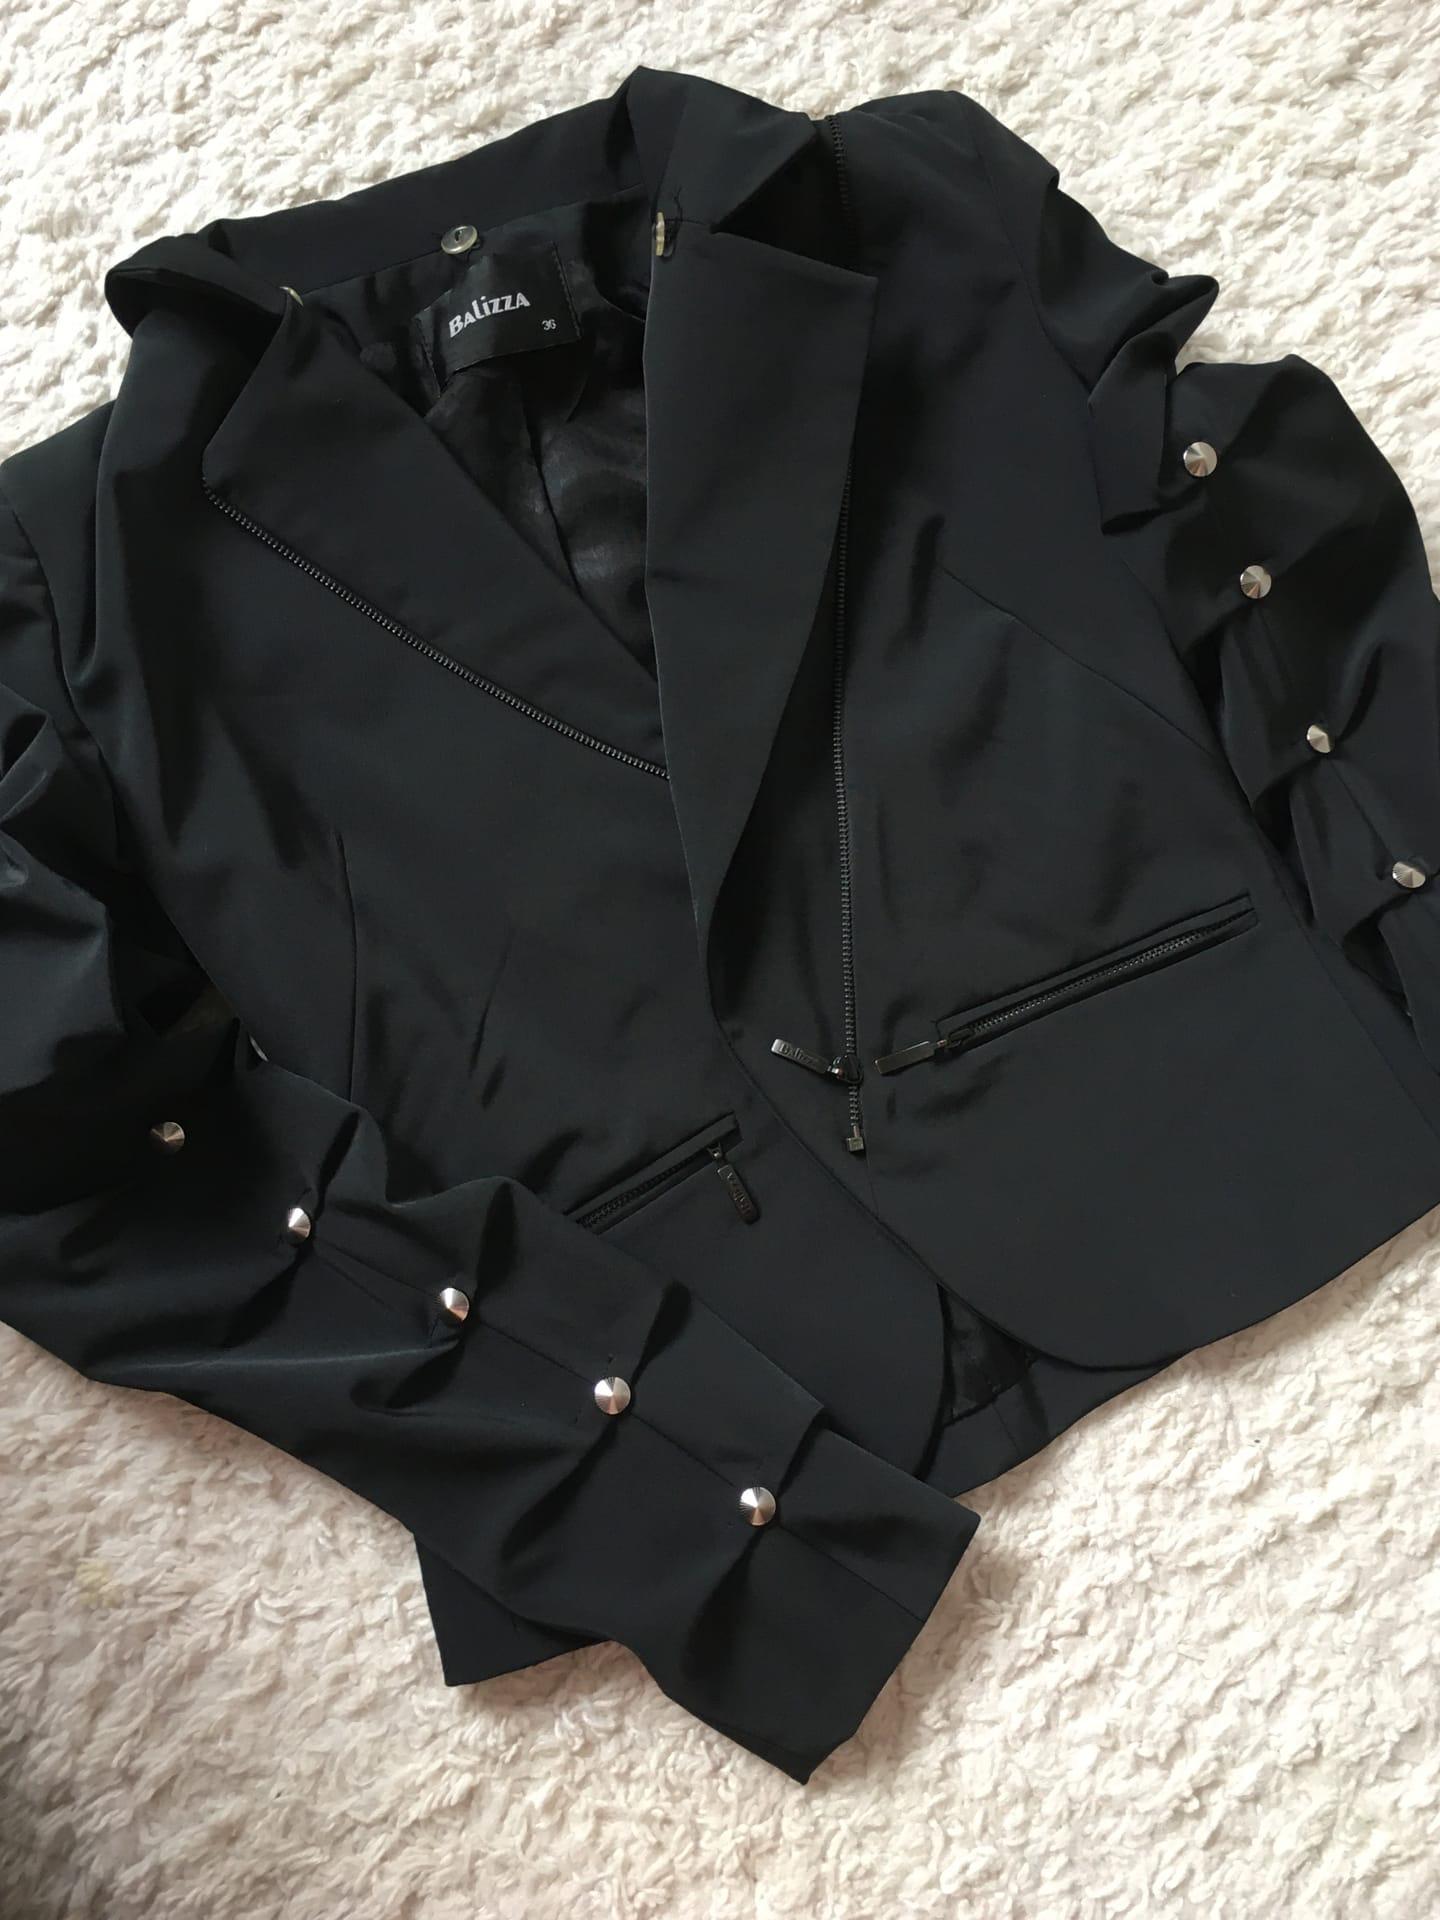 Костюм размер 42 цена 1500р, пиджак размер 42 цена 1200